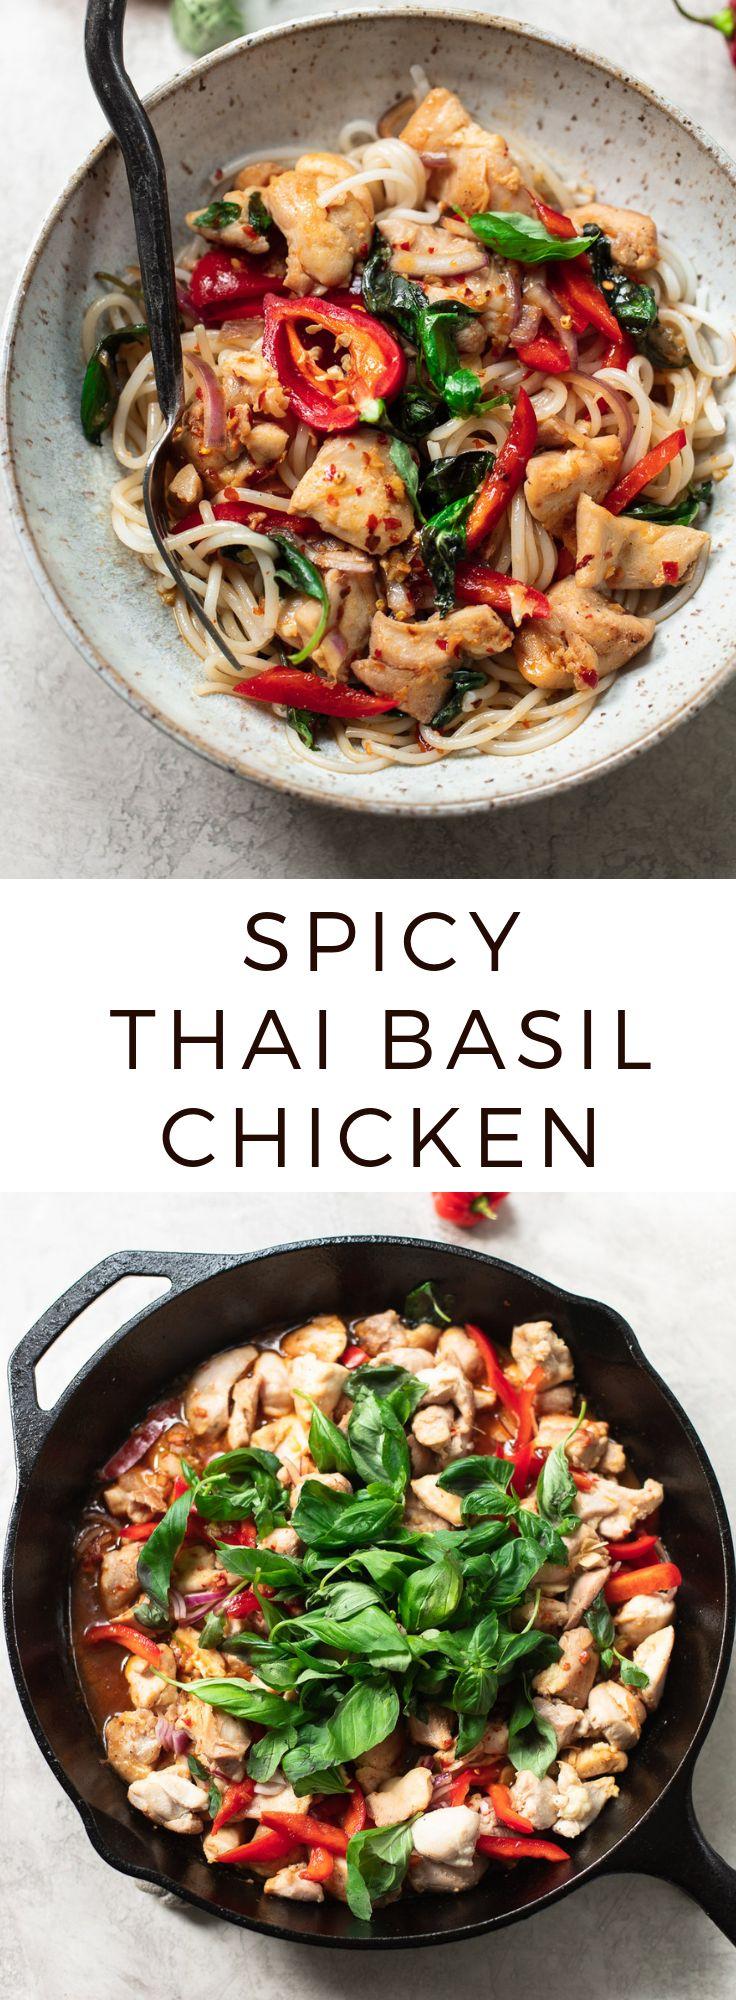 Fresh Thai Basil Chicken with Chili Garlic Sauce